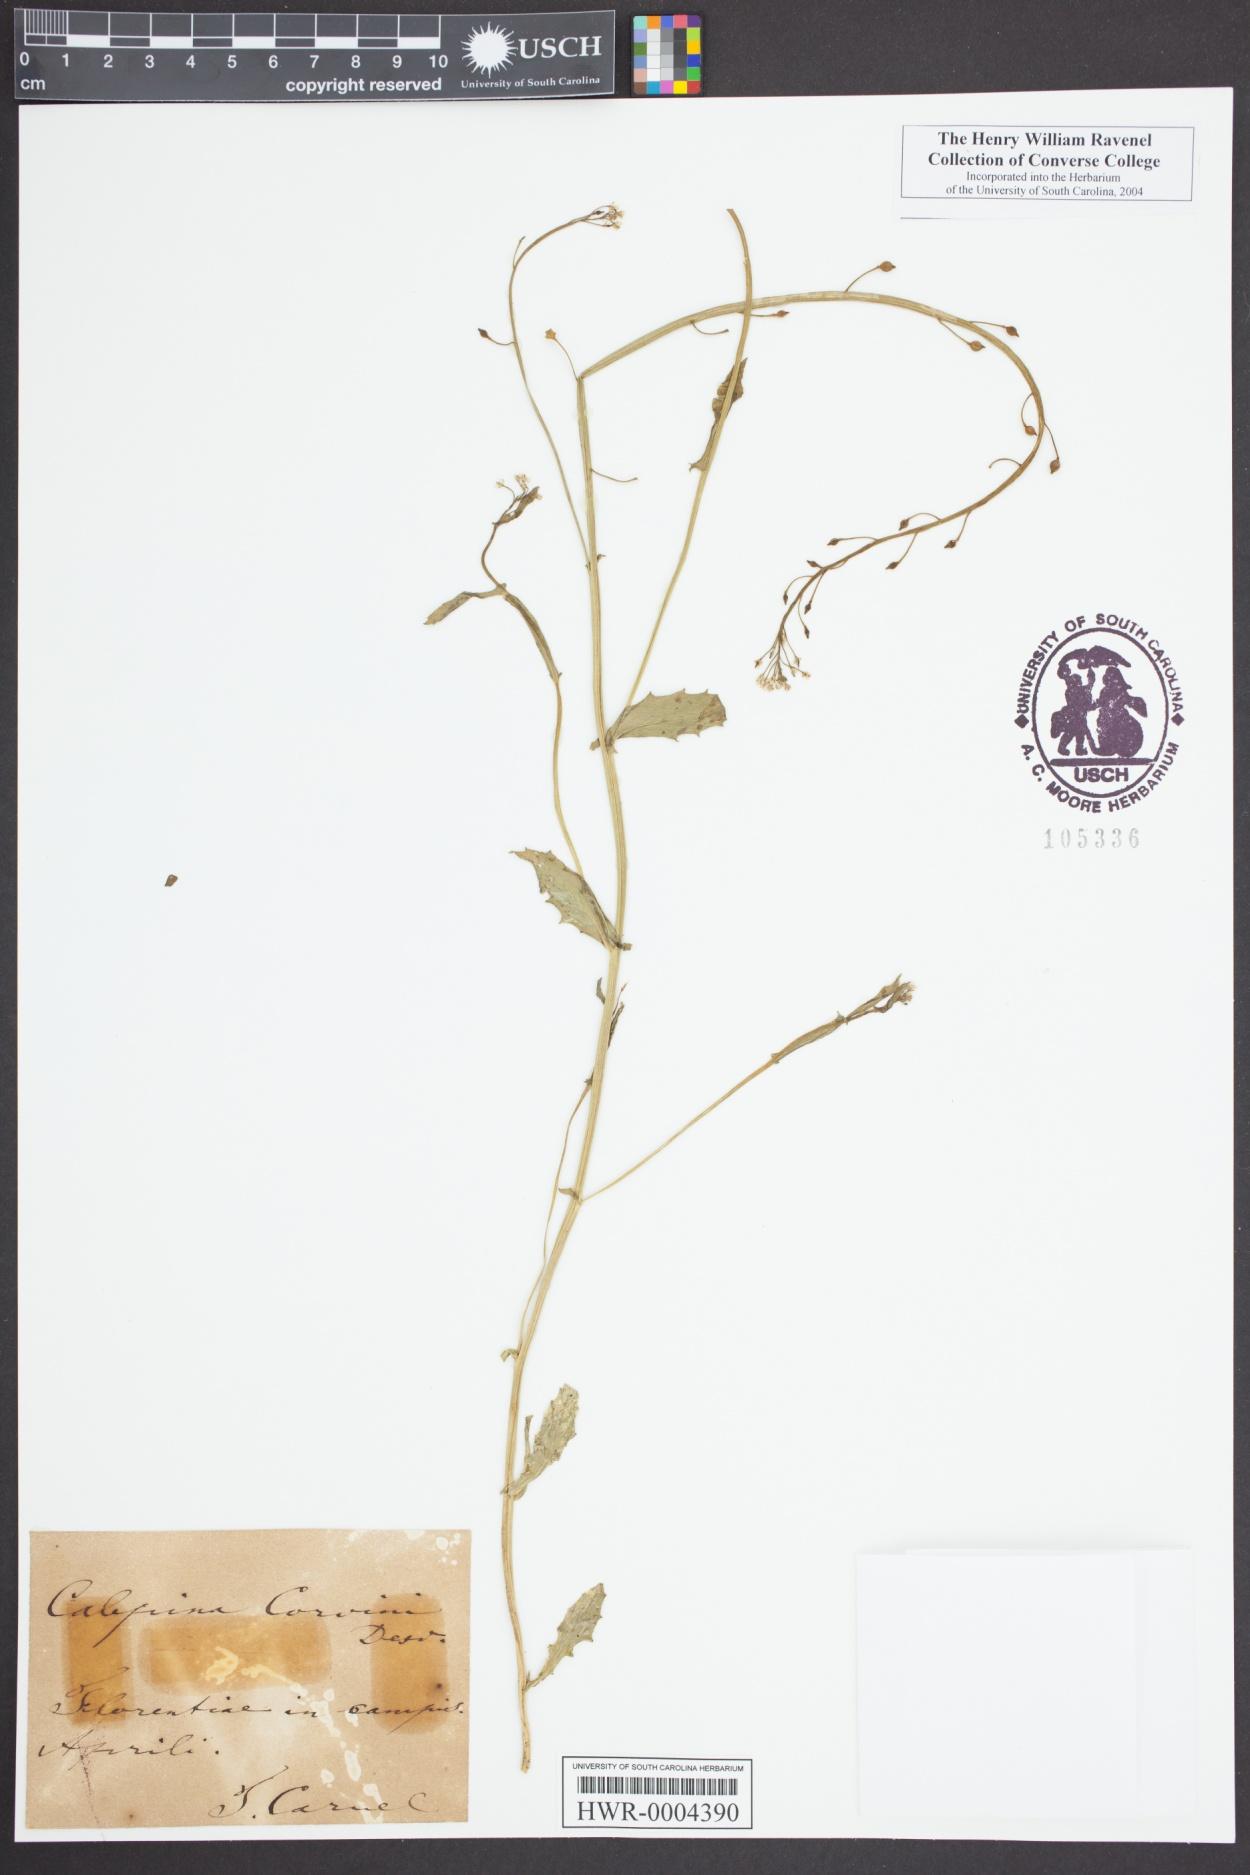 Calepina image